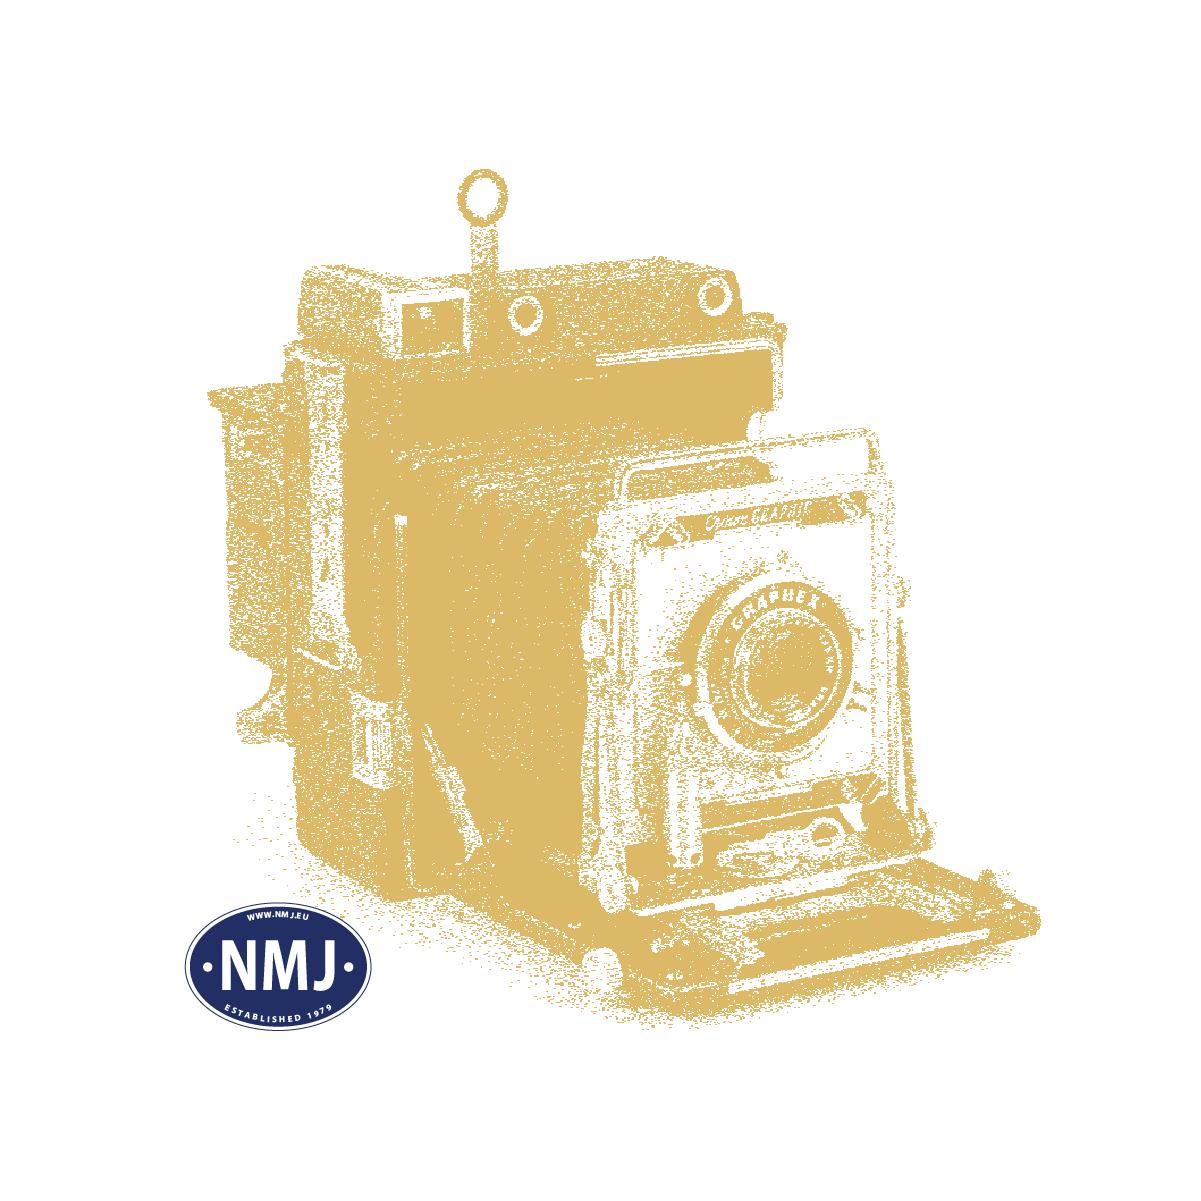 NMJT90012 - NMJ Topline NSB Di3a 619, Red/Brown Livery, DC